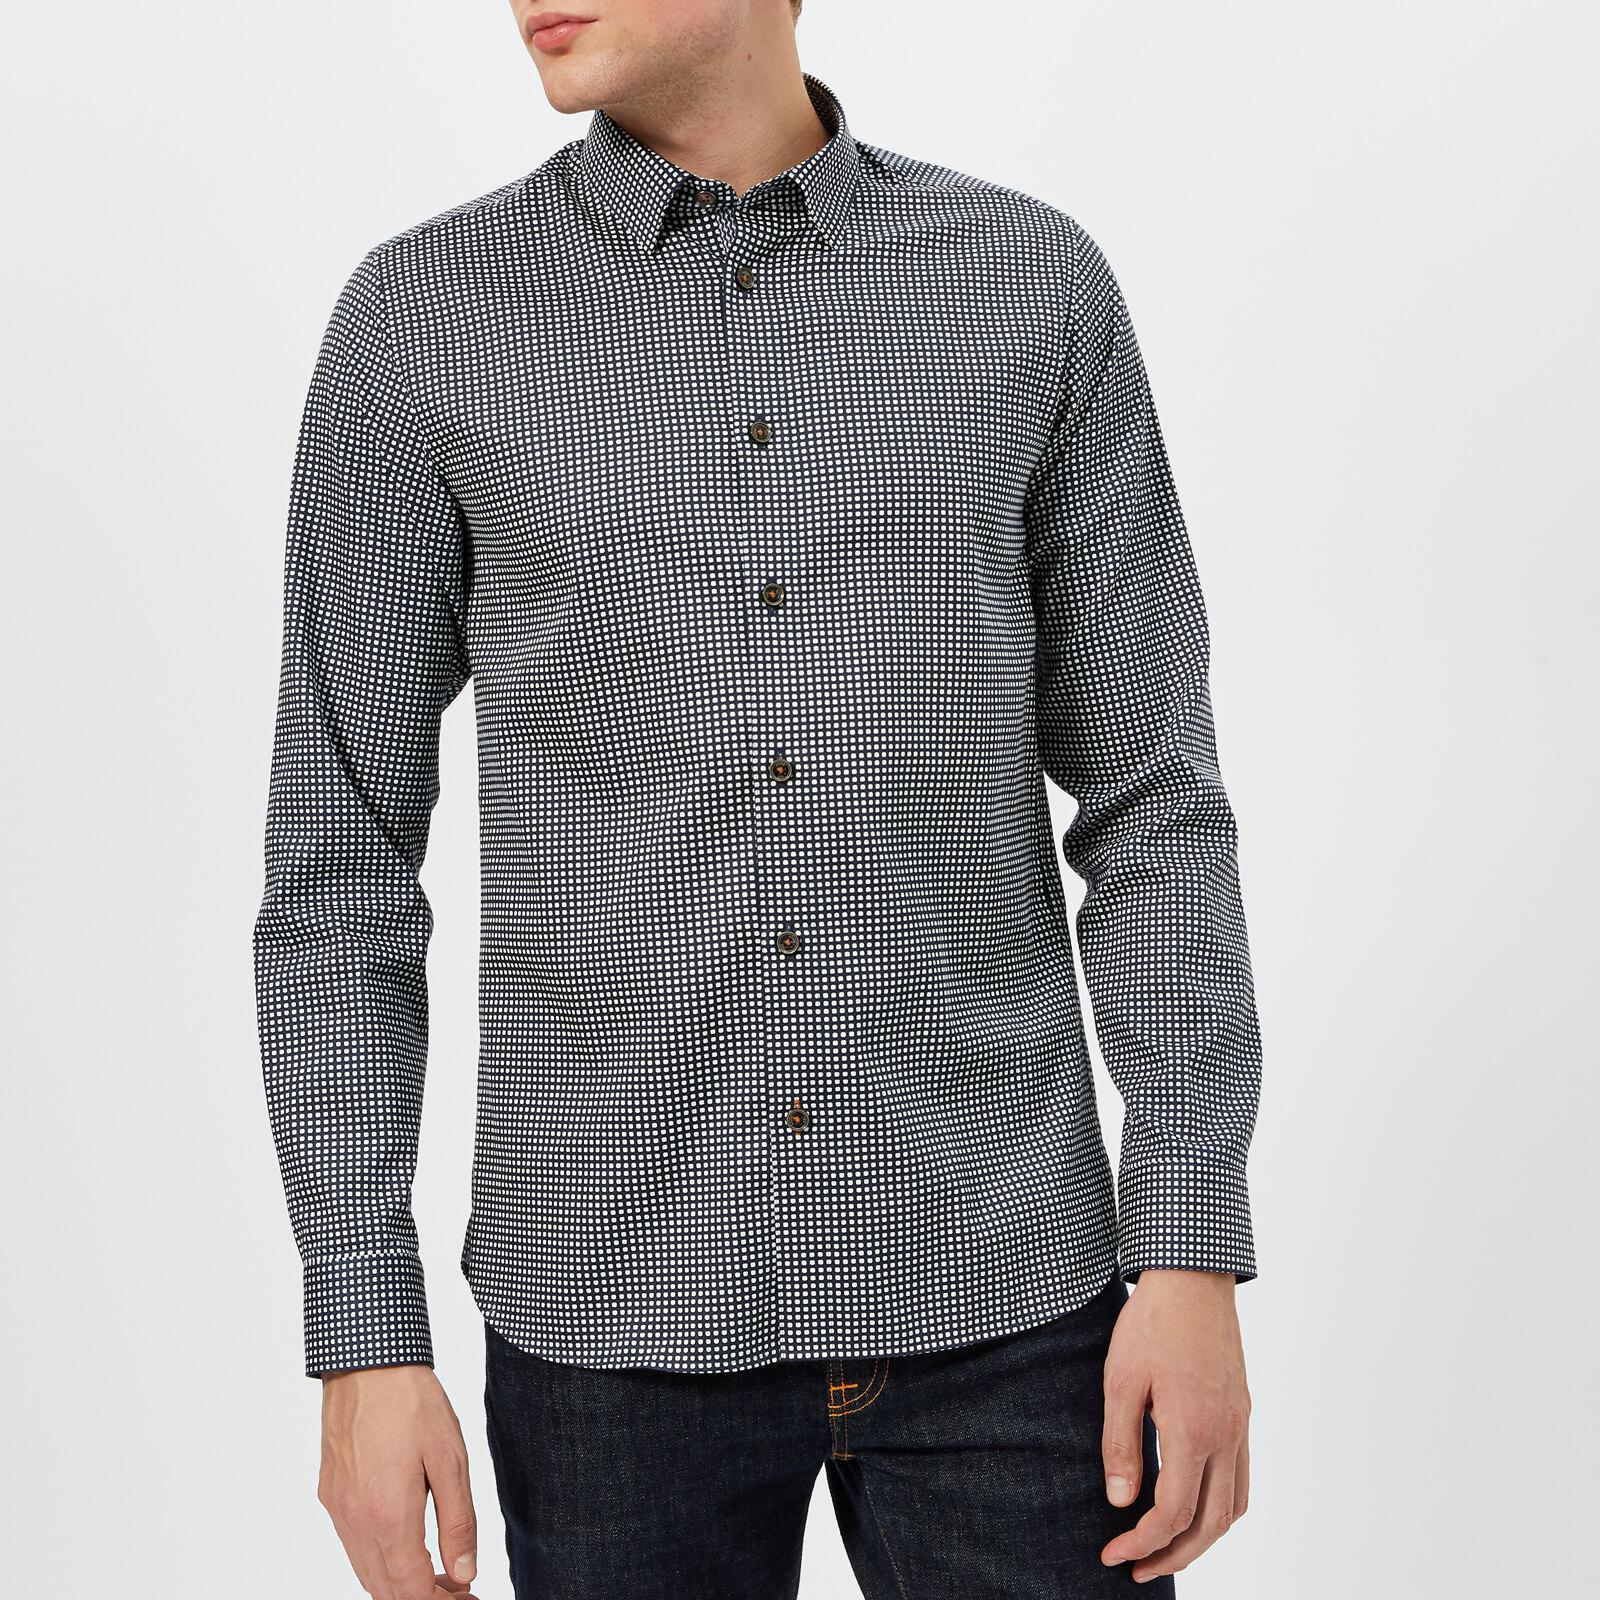 9b8fc3aad0dbd Ted Baker Jenkins Geo Print Long Sleeve Shirt in Blue for Men - Lyst